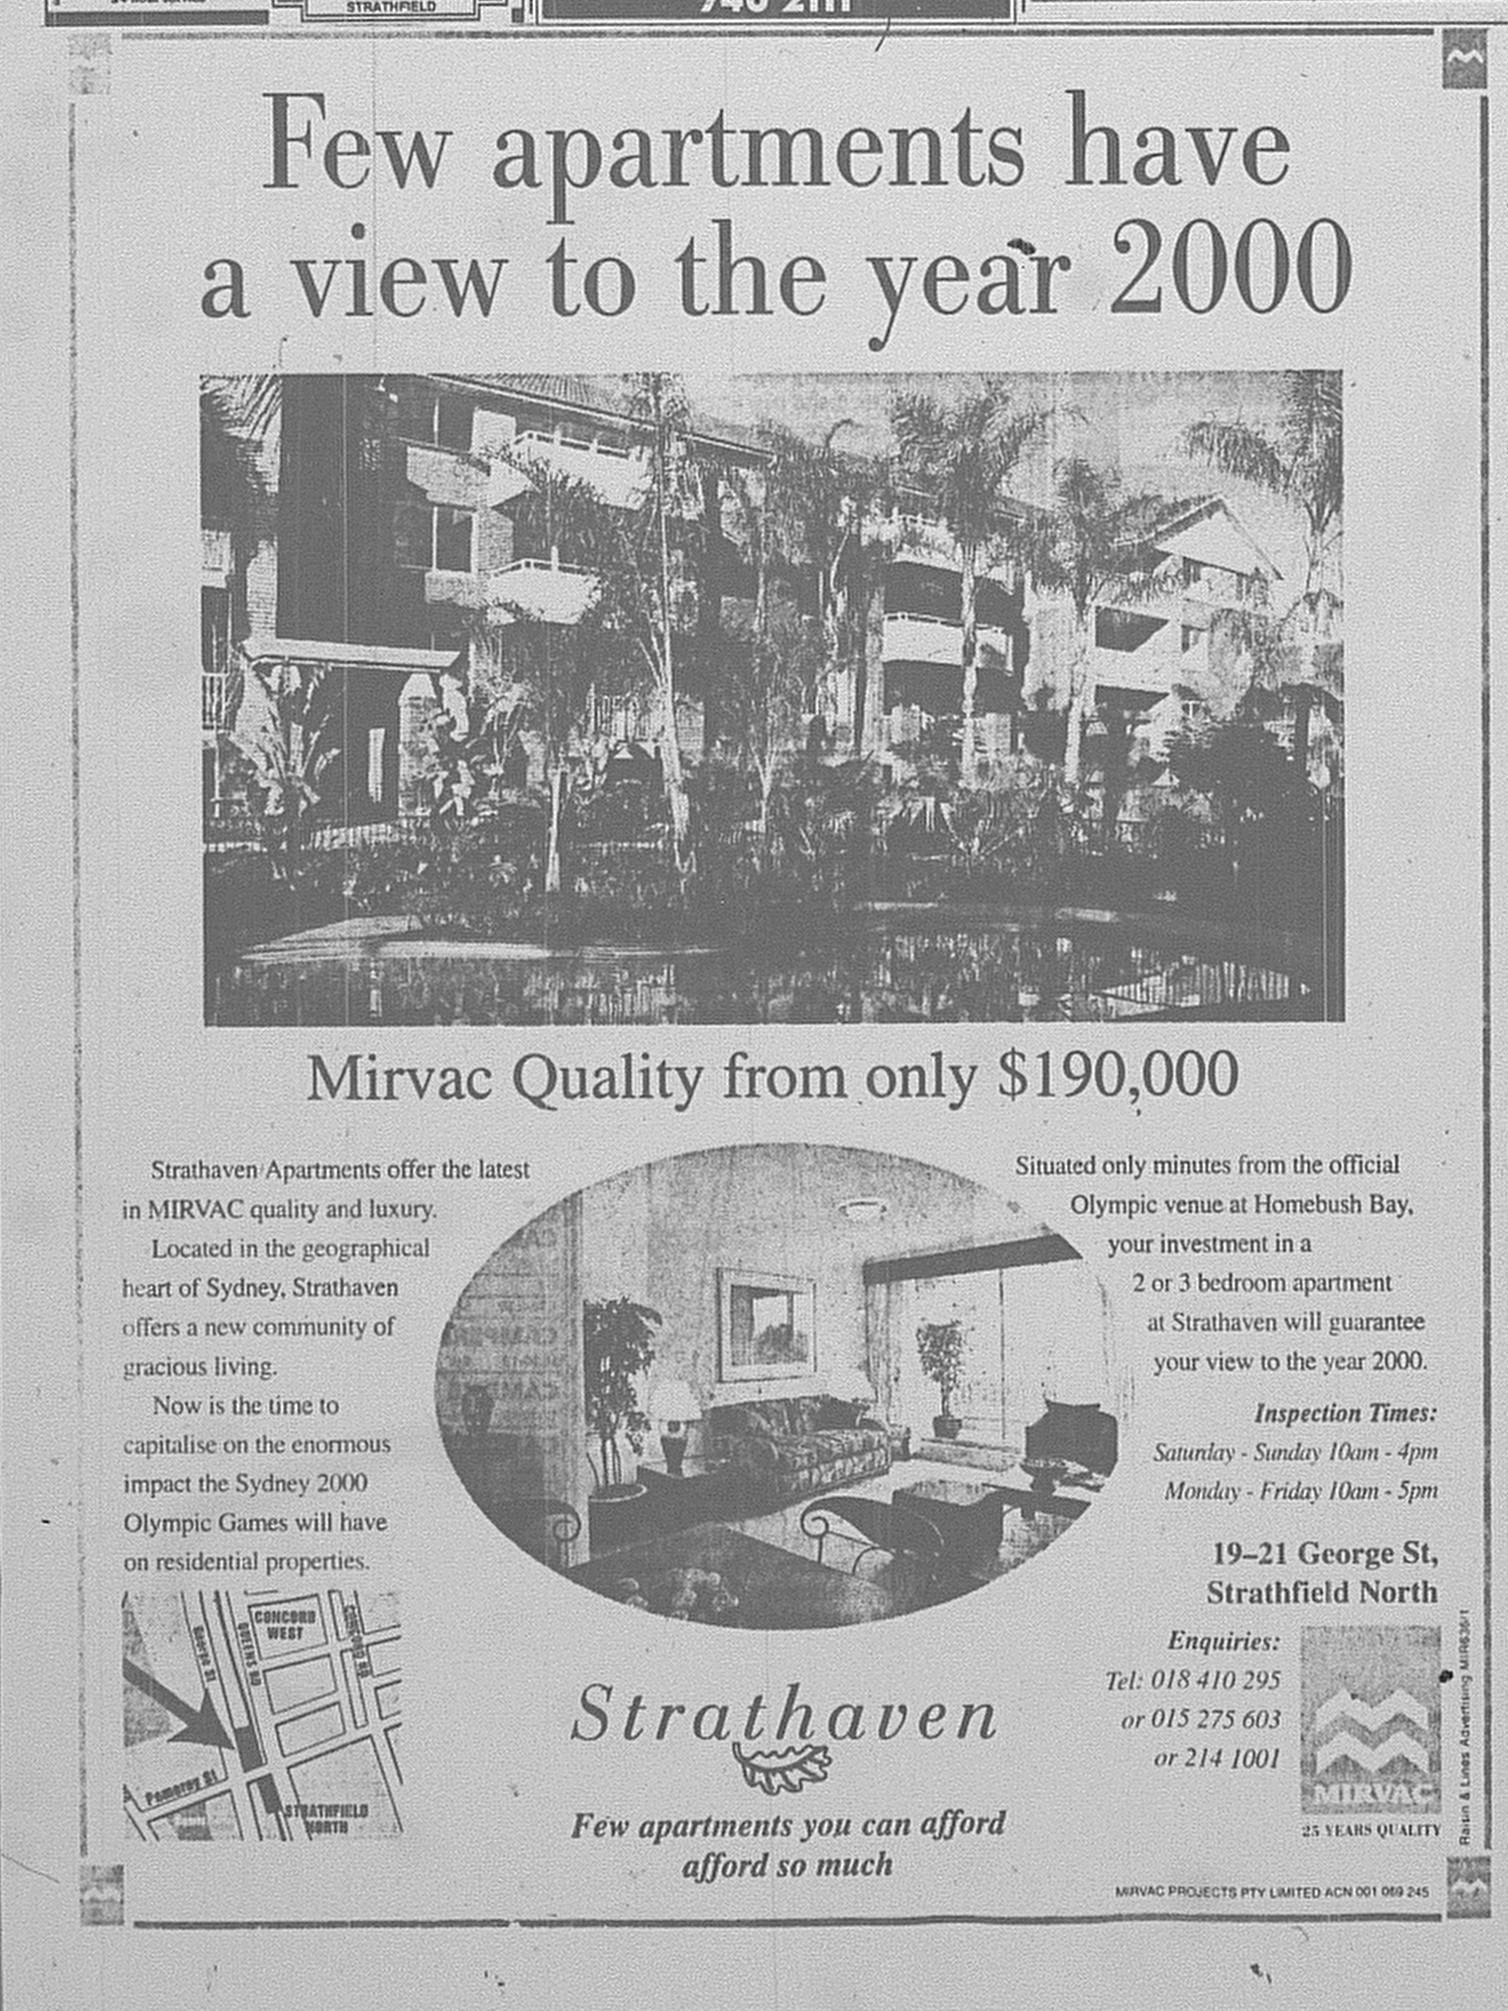 Strathaven June 24 1995 SMH 91